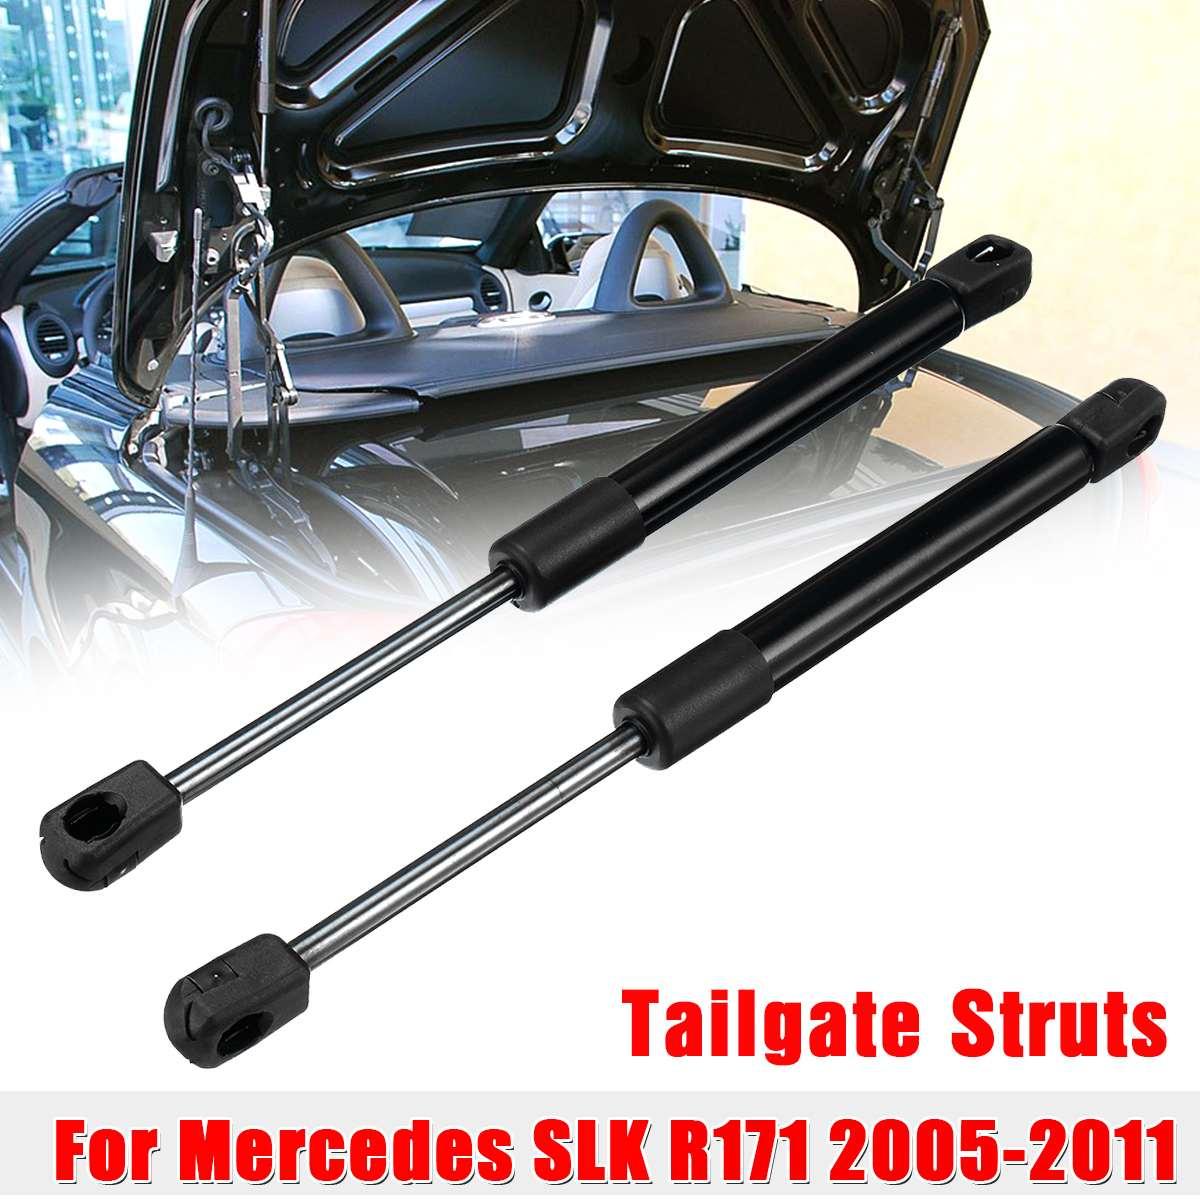 2X maletero trasero portón trasero descarga de resorte de gas elevación puntales soporte barra 1717500036 para Mercedes Benz SLK para R171 2005-2011